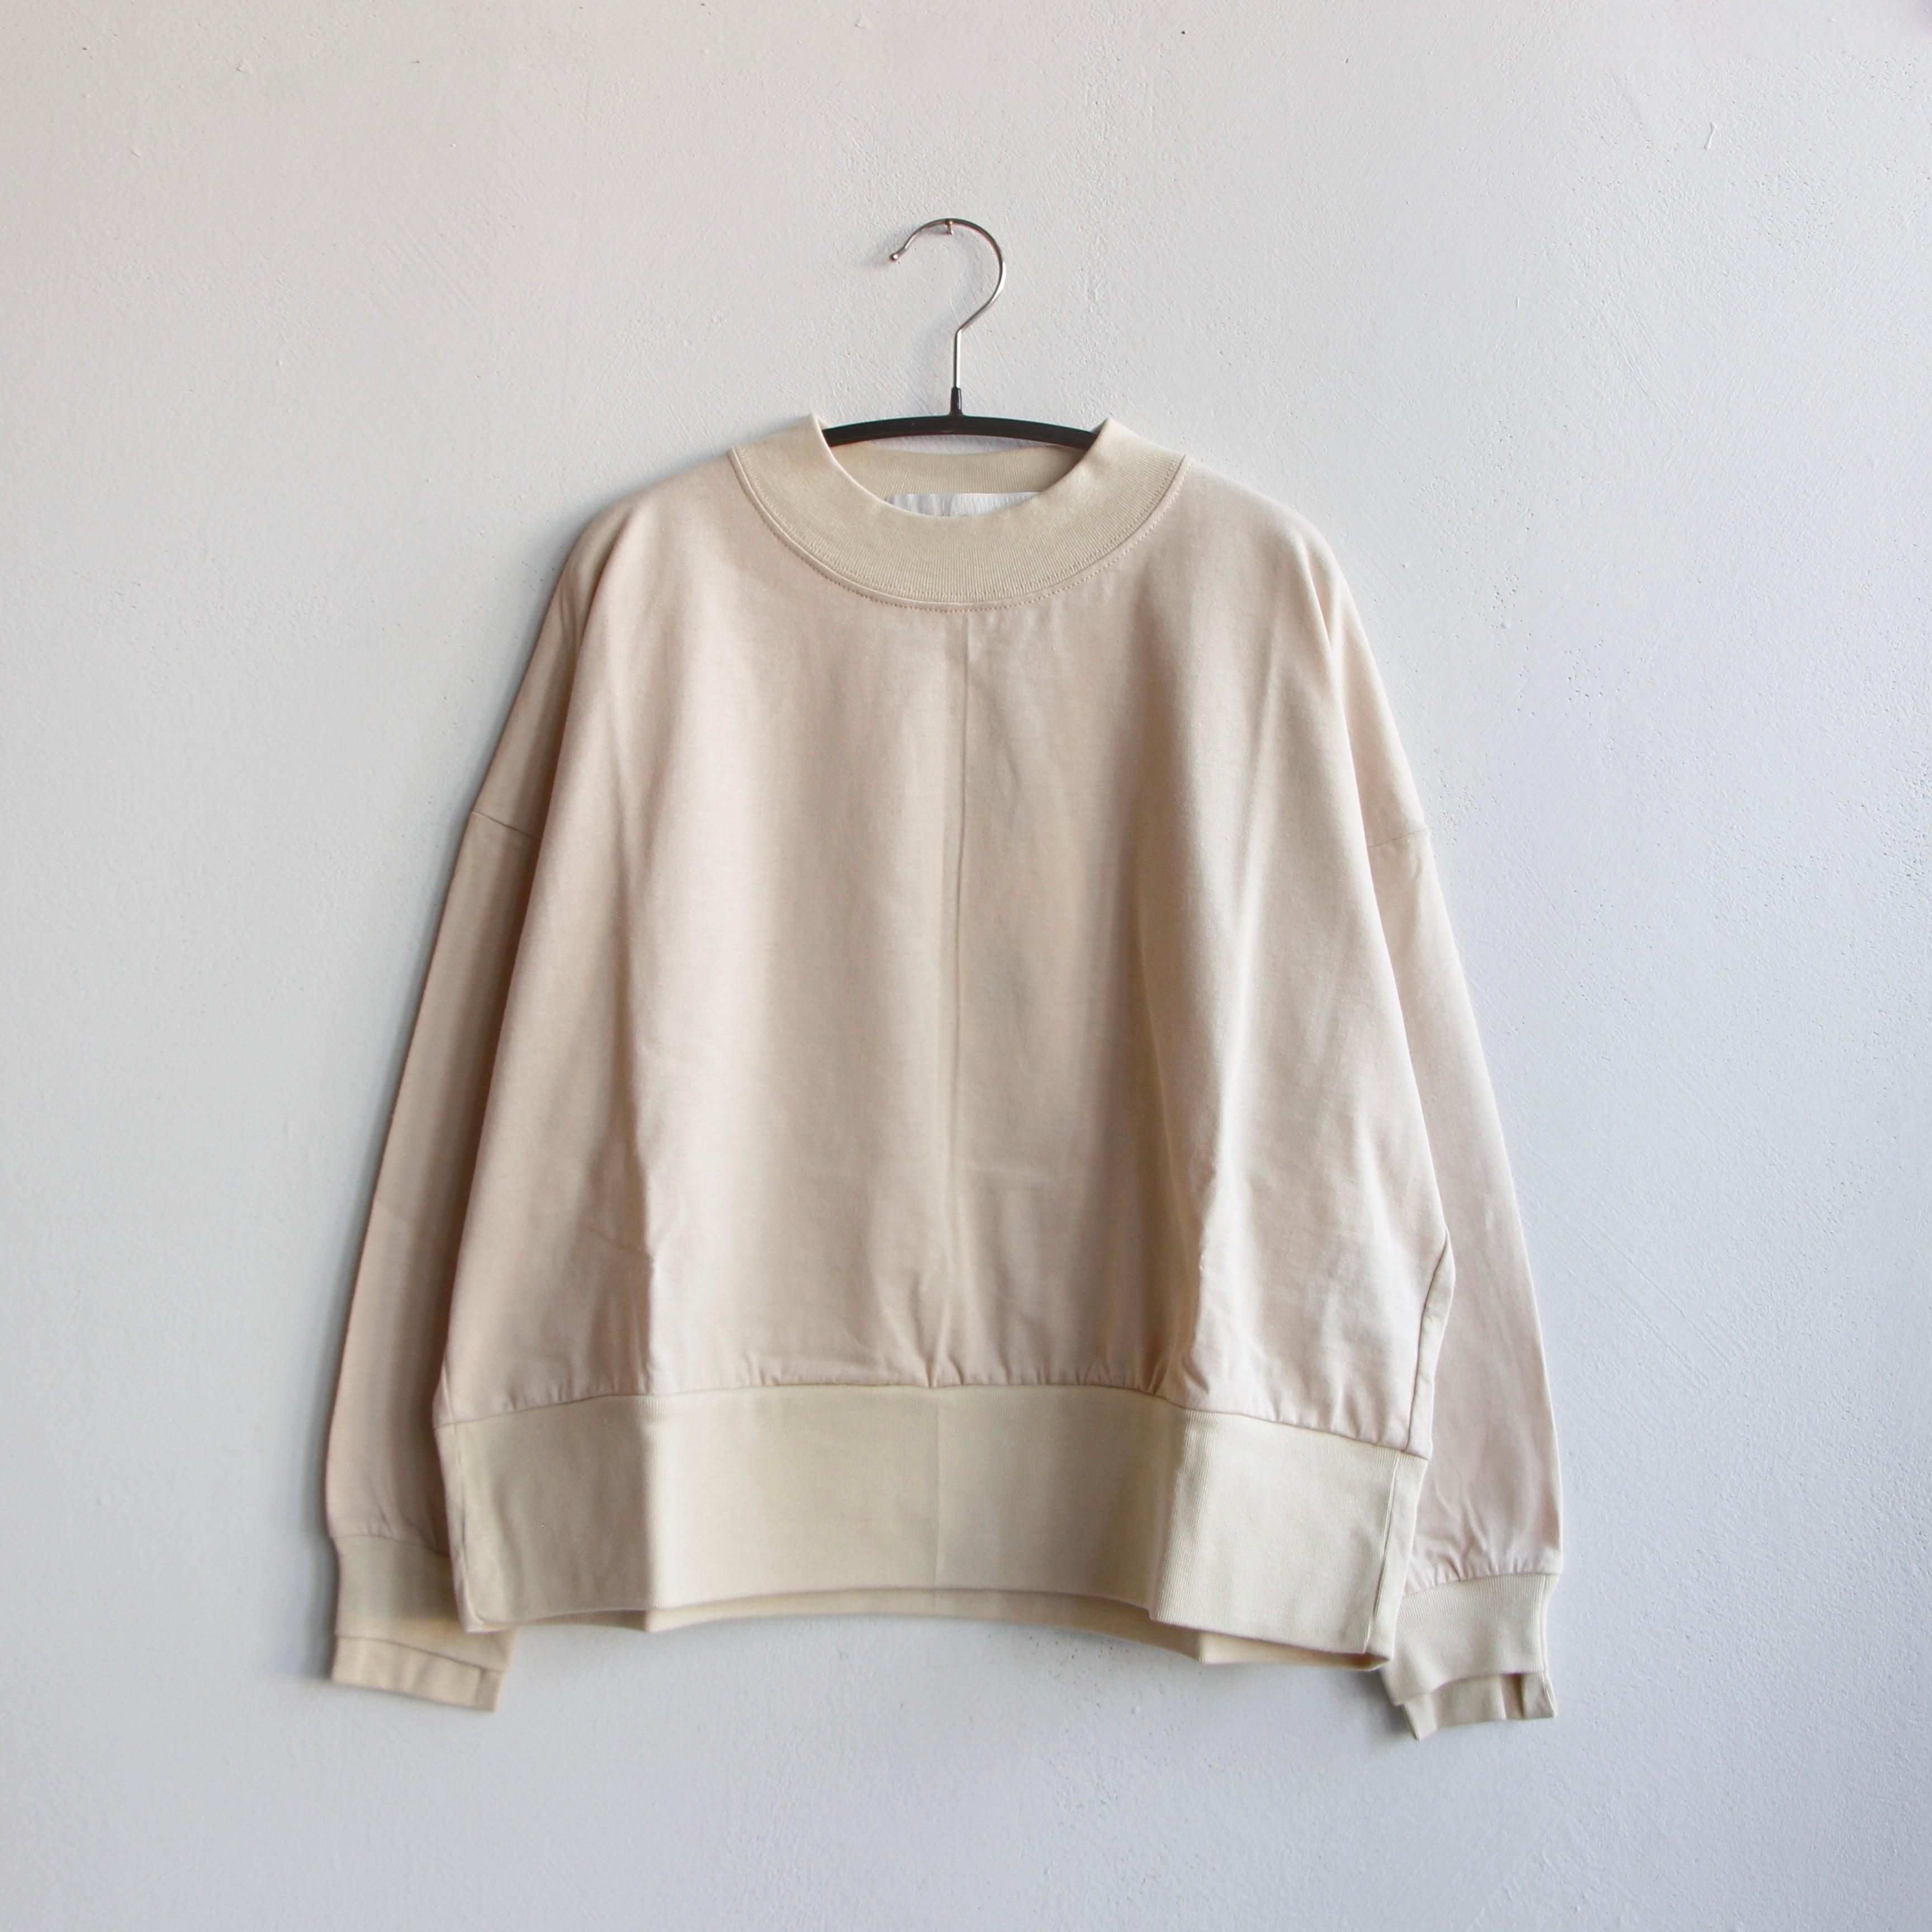 《UNIONINI 2021AW》reflect logo long sleeved tee / light beige / 2-12Y